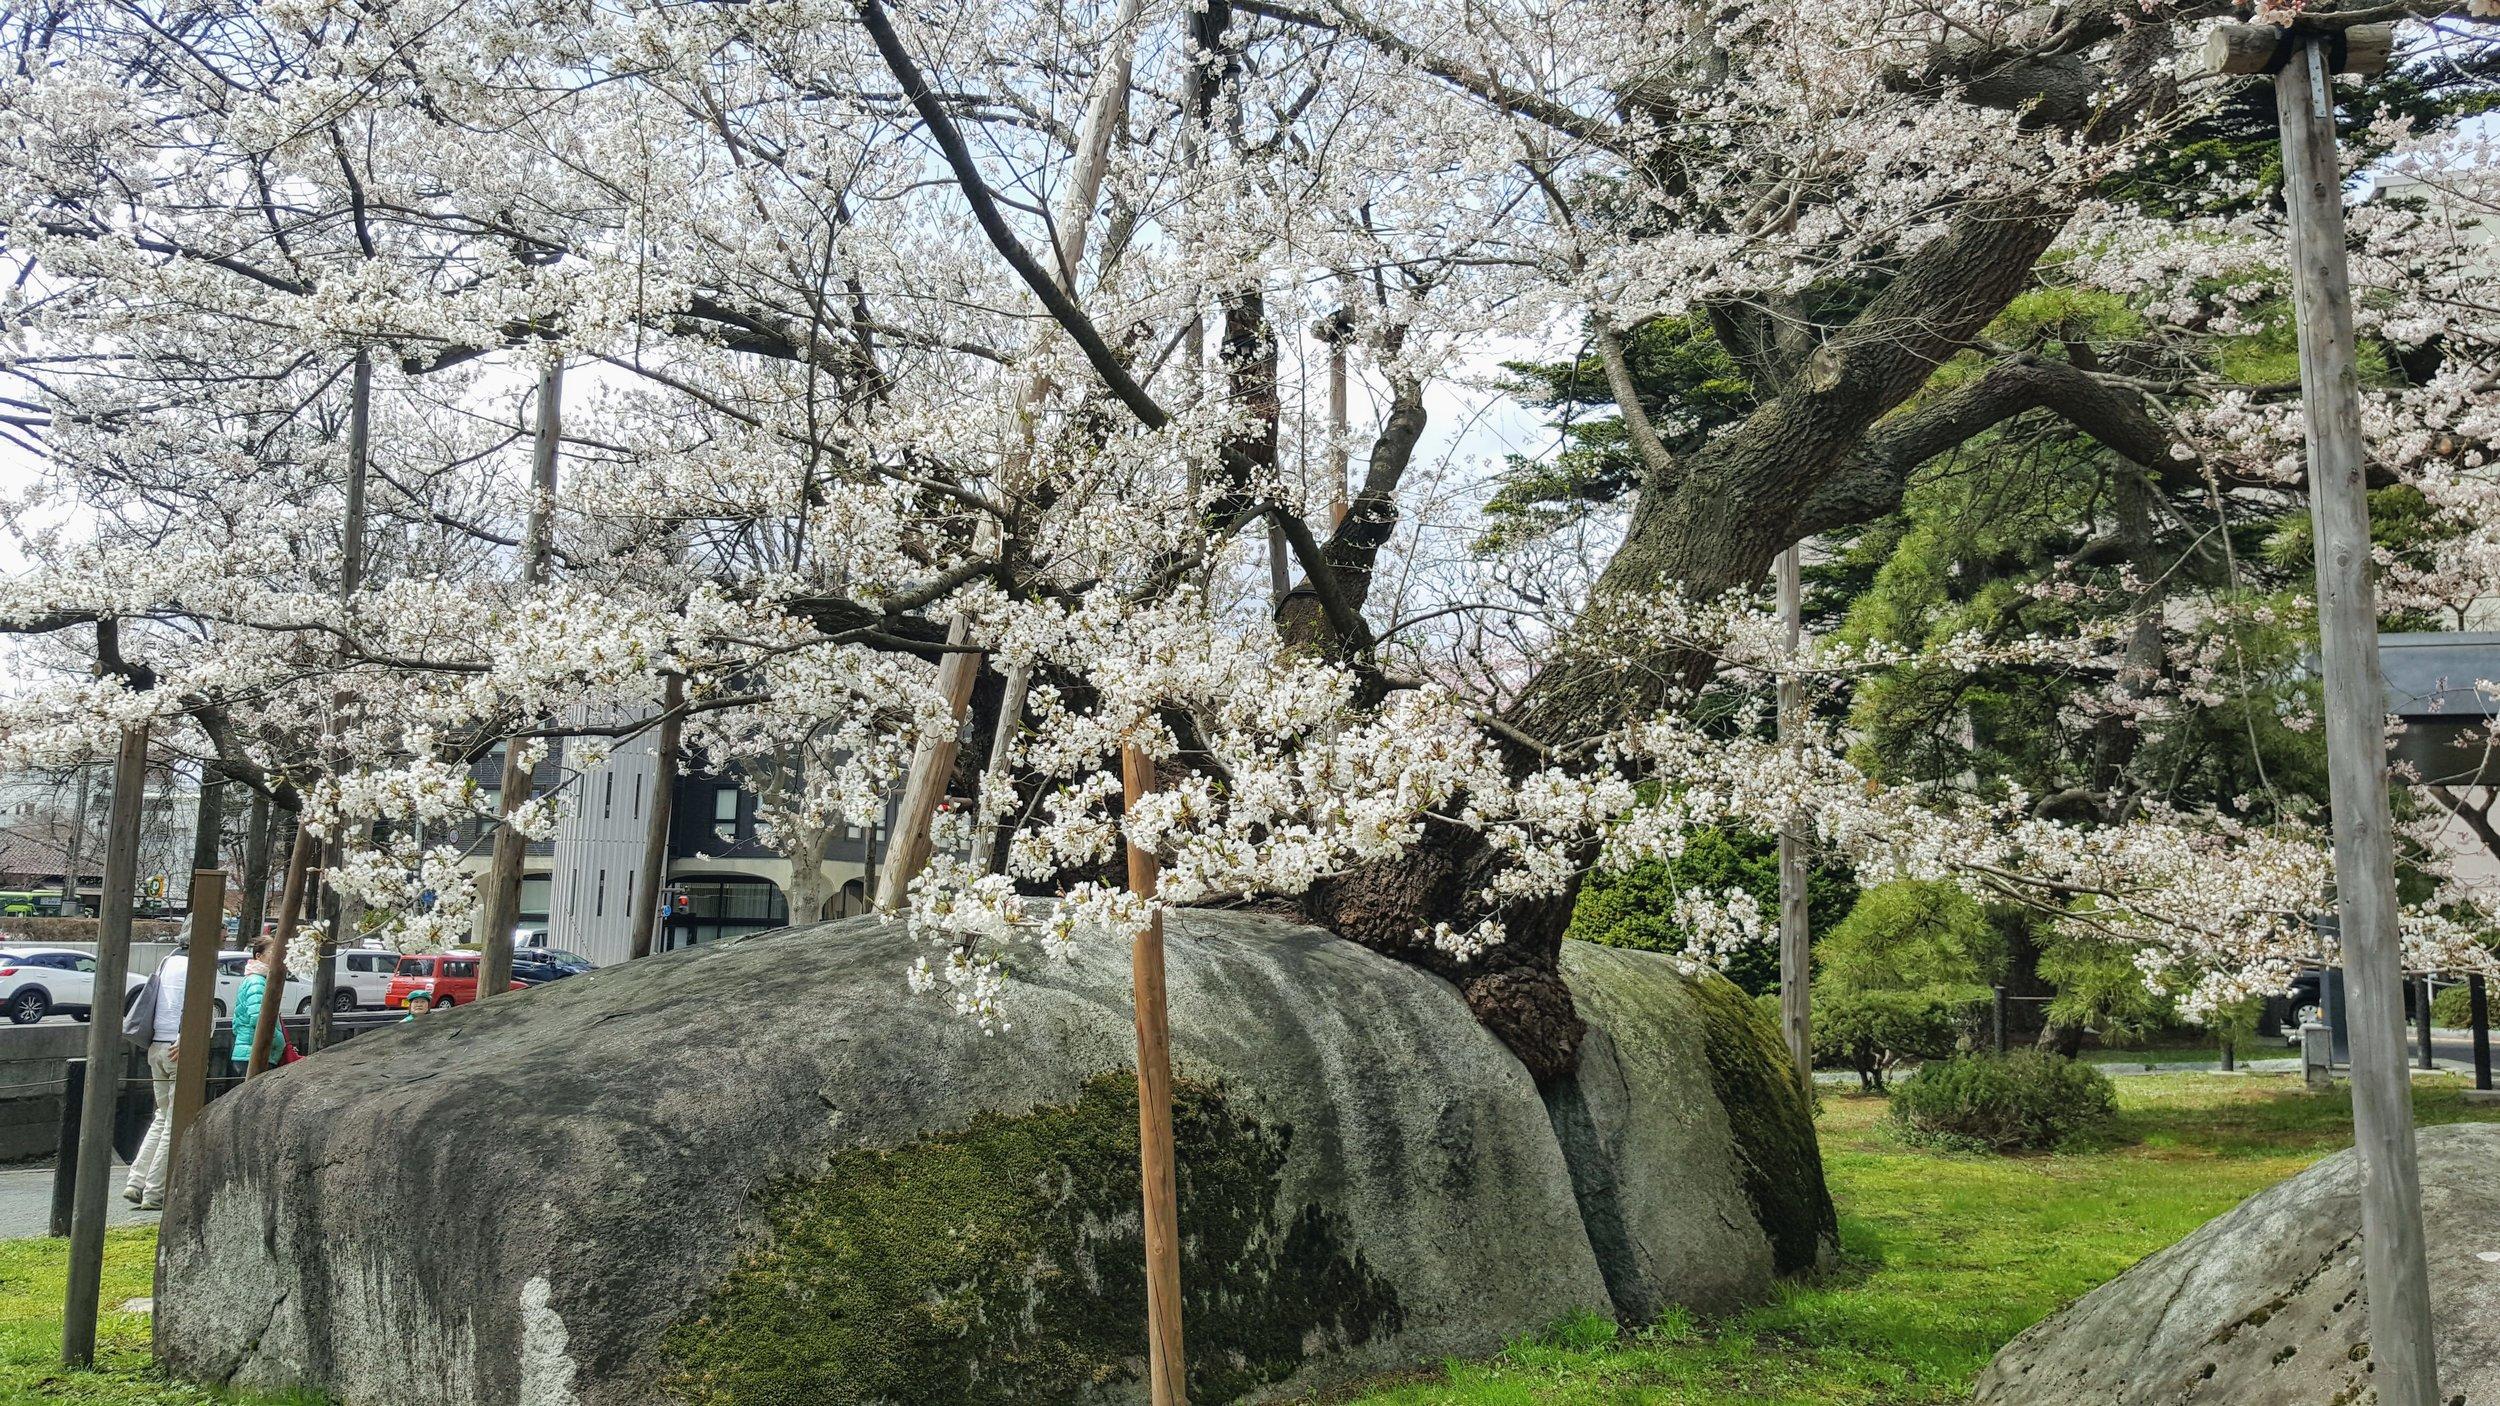 Rock-splitting cherry tree